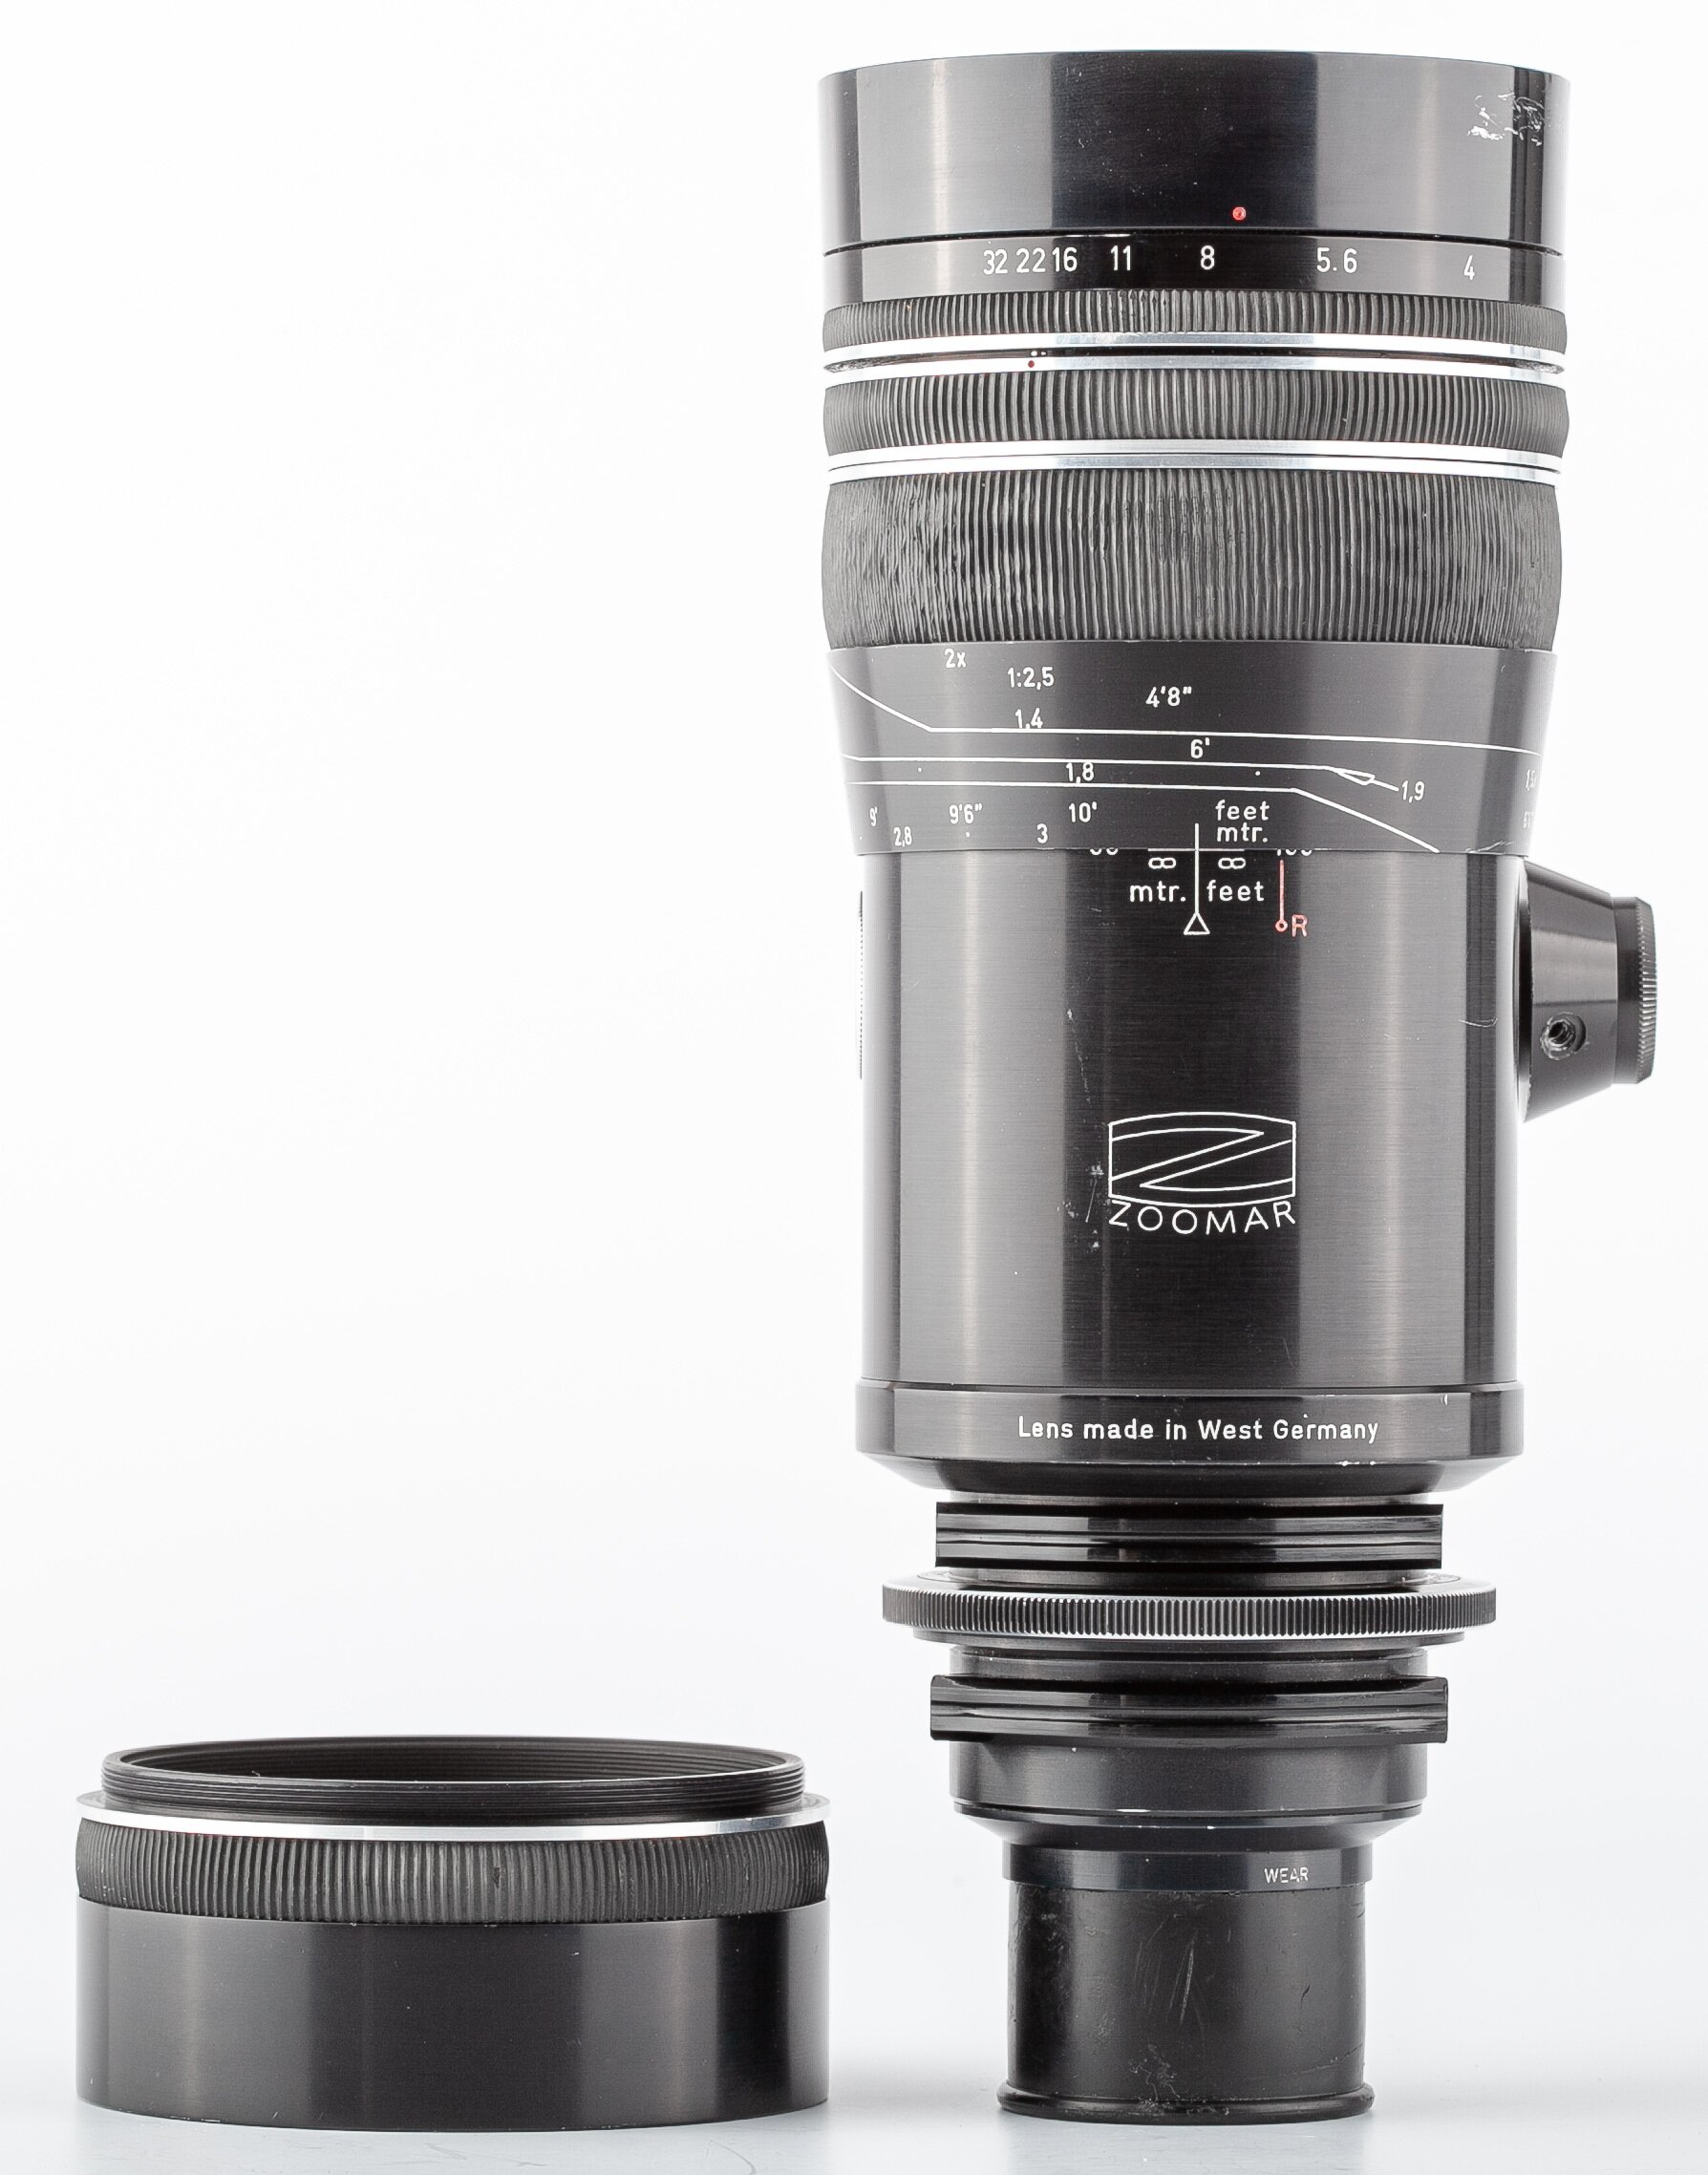 Kilfitt Zoomar Pan-Tele-Kilar 4/300mm Arriflex